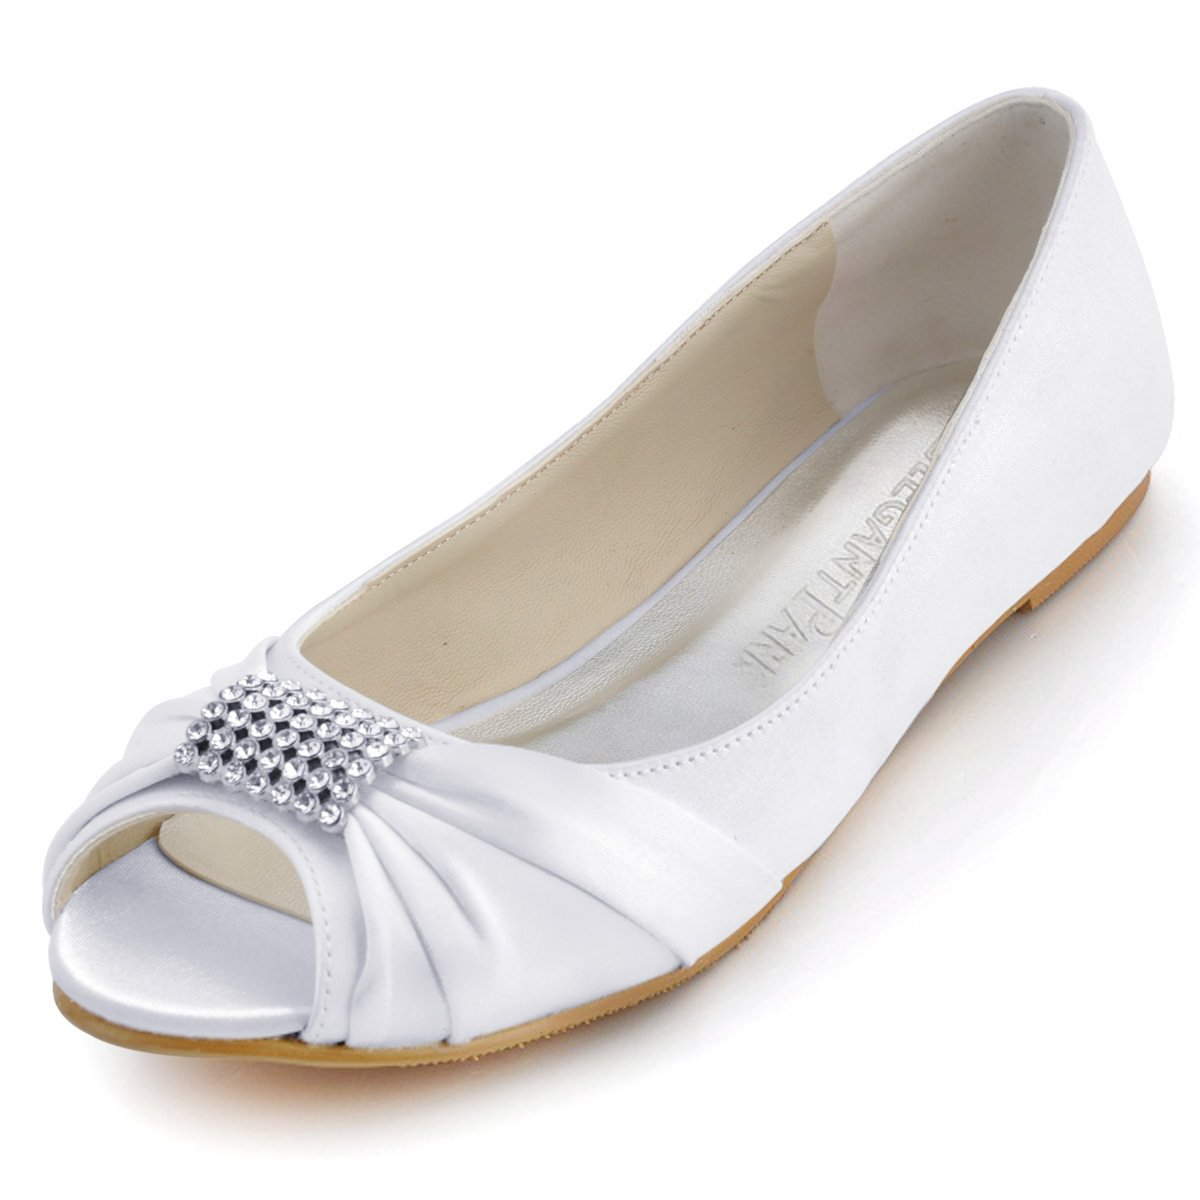 ElegantPark EP2053 Women Peep Toe Rhinestones Comfort Flats Pleated Satin Wedding Bridal Shoes White US 10